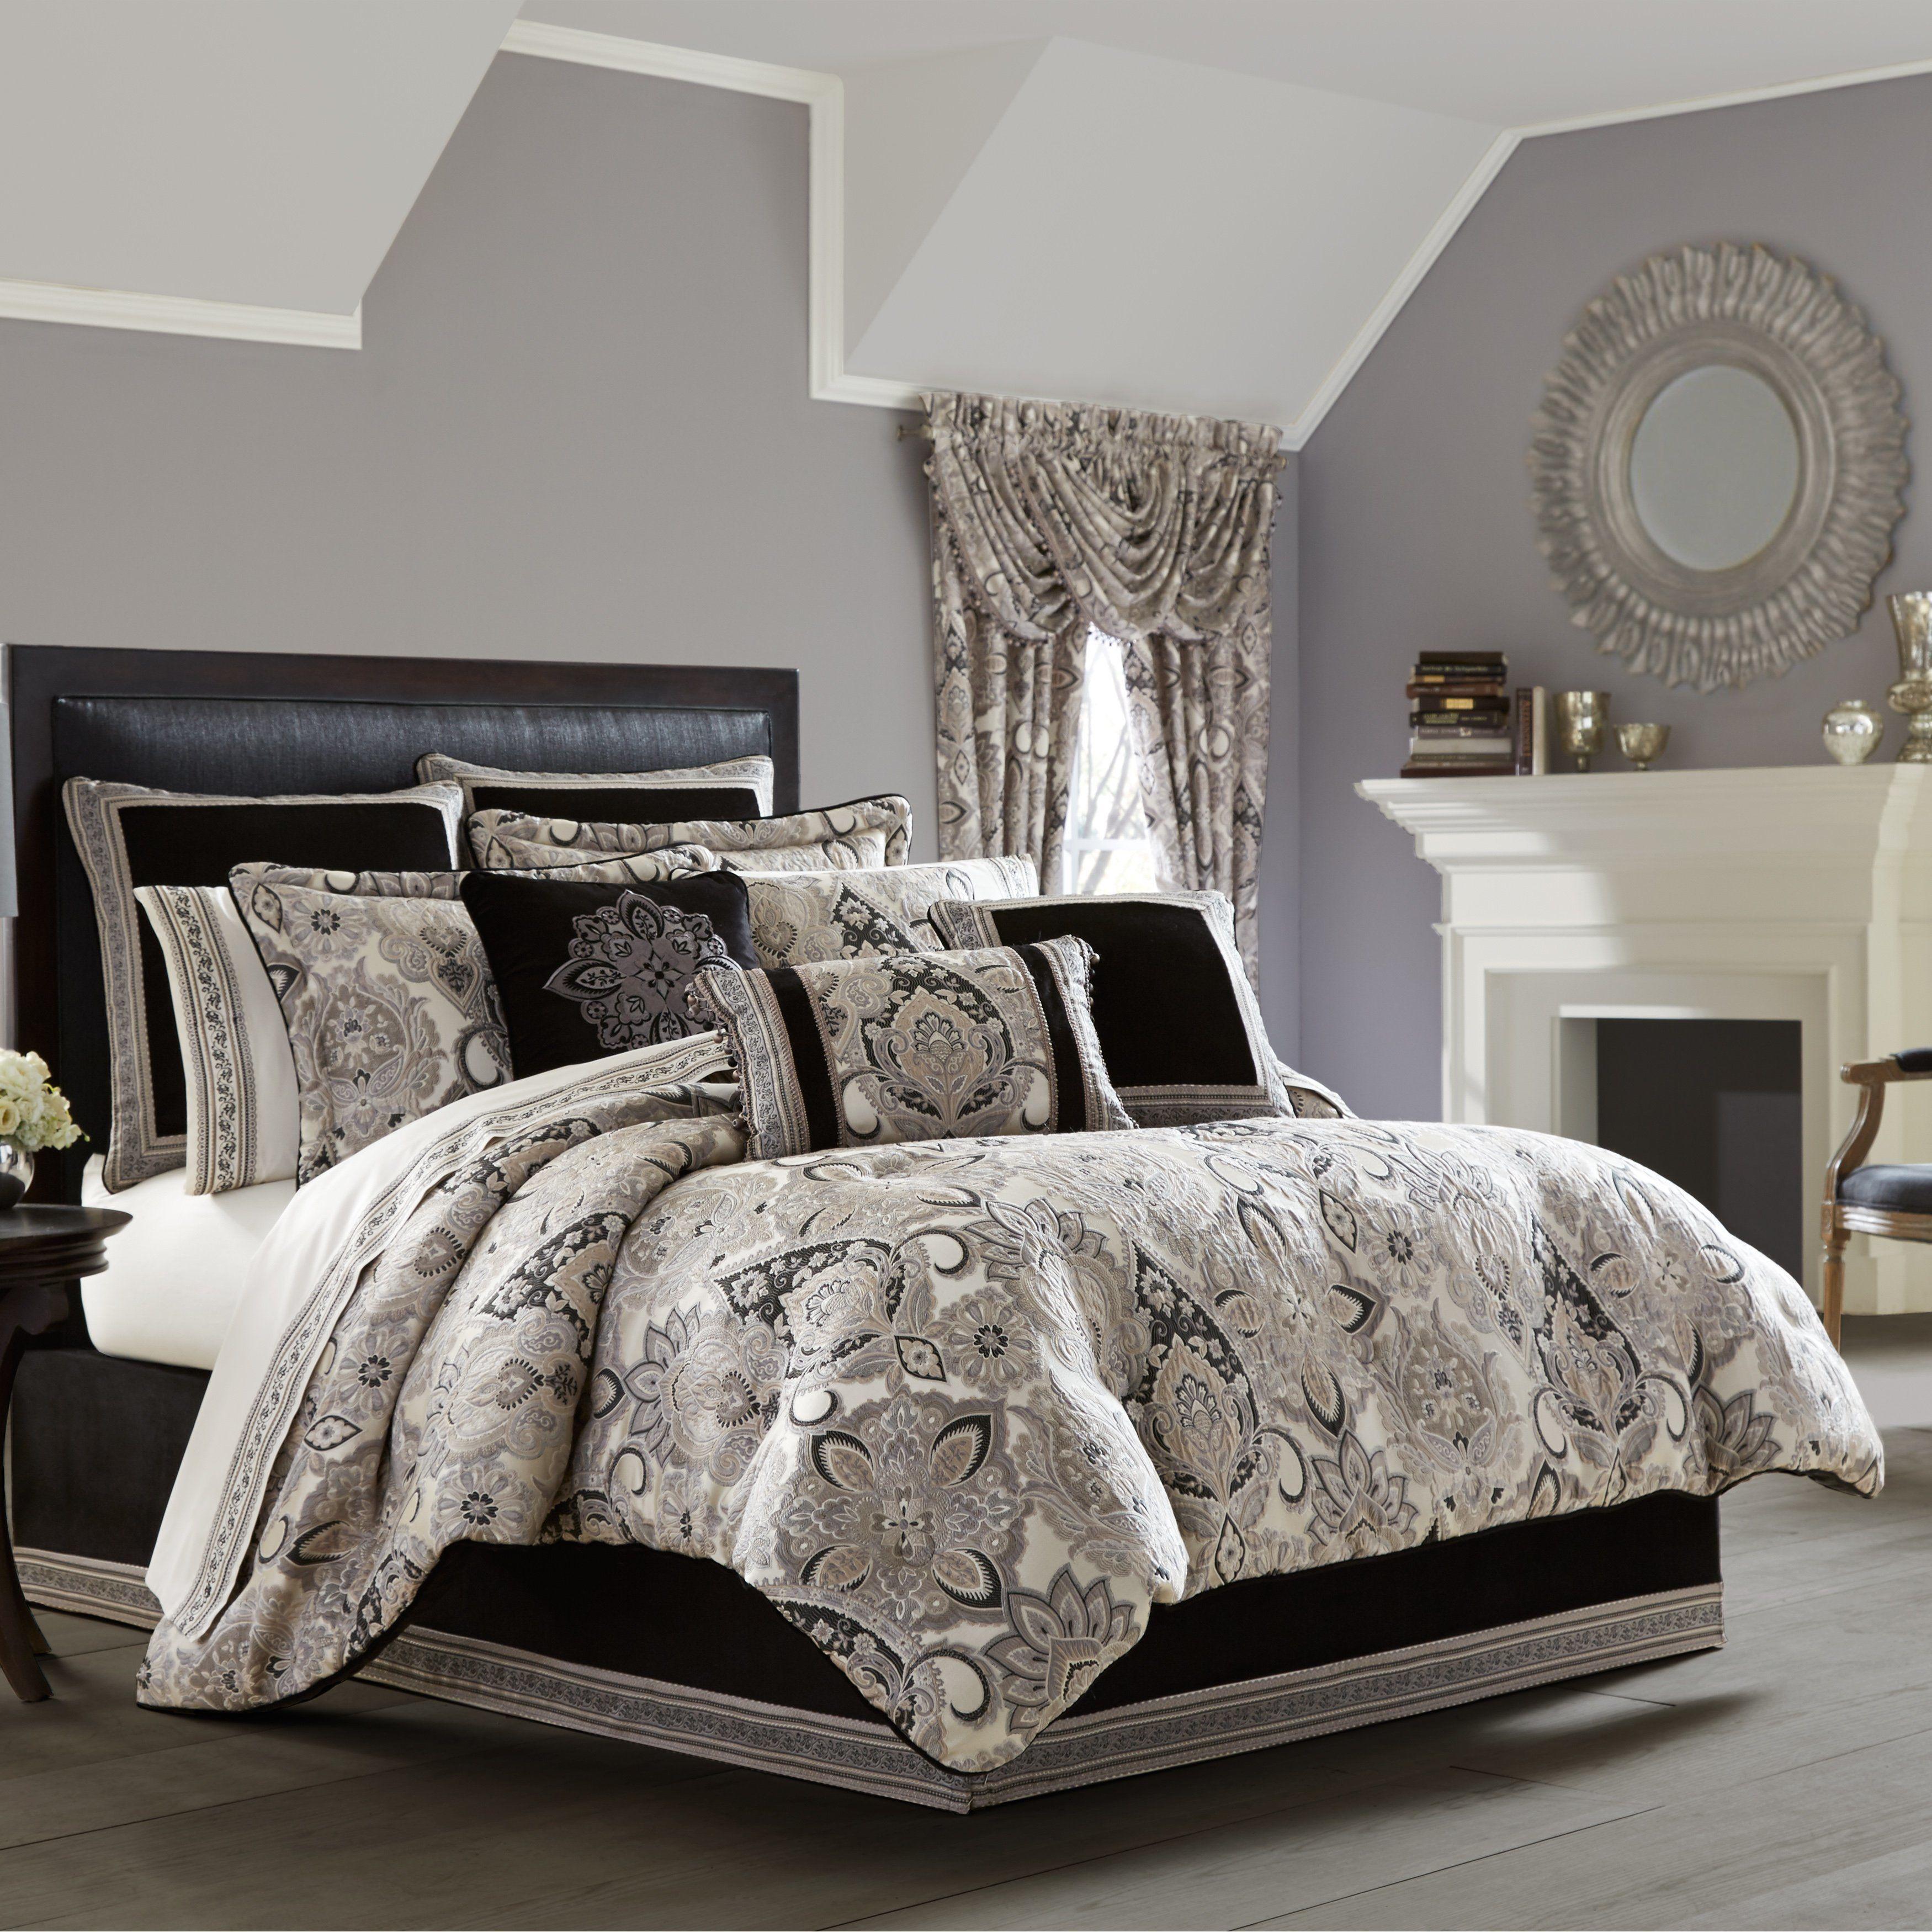 Guiliana Silver/Black 4Piece Comforter Set in 2020